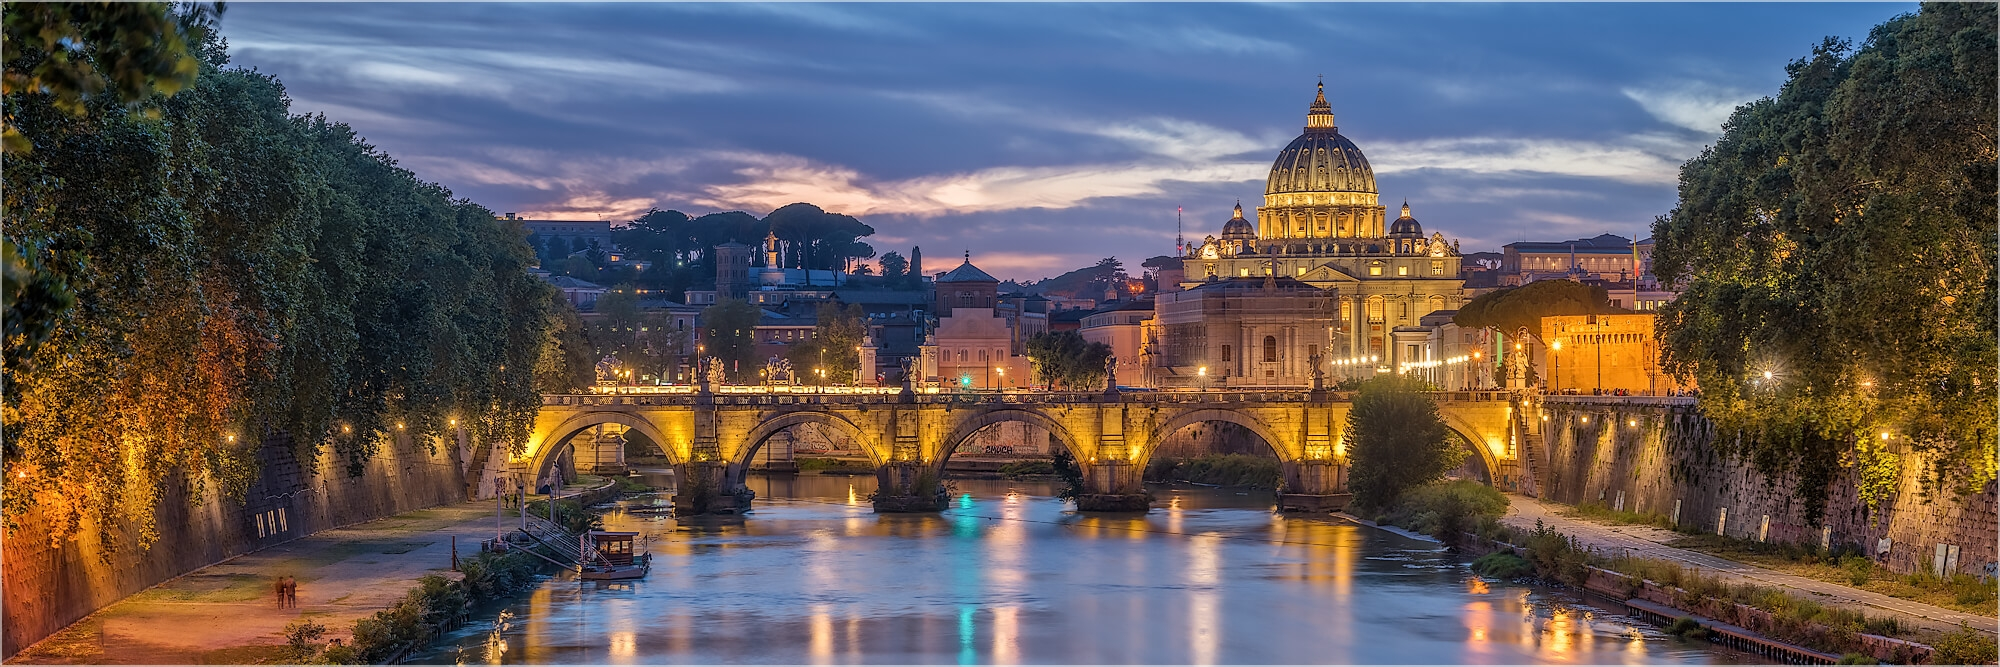 Panoramabild Sonnenuntergang Tiberbrücke Rom Italien